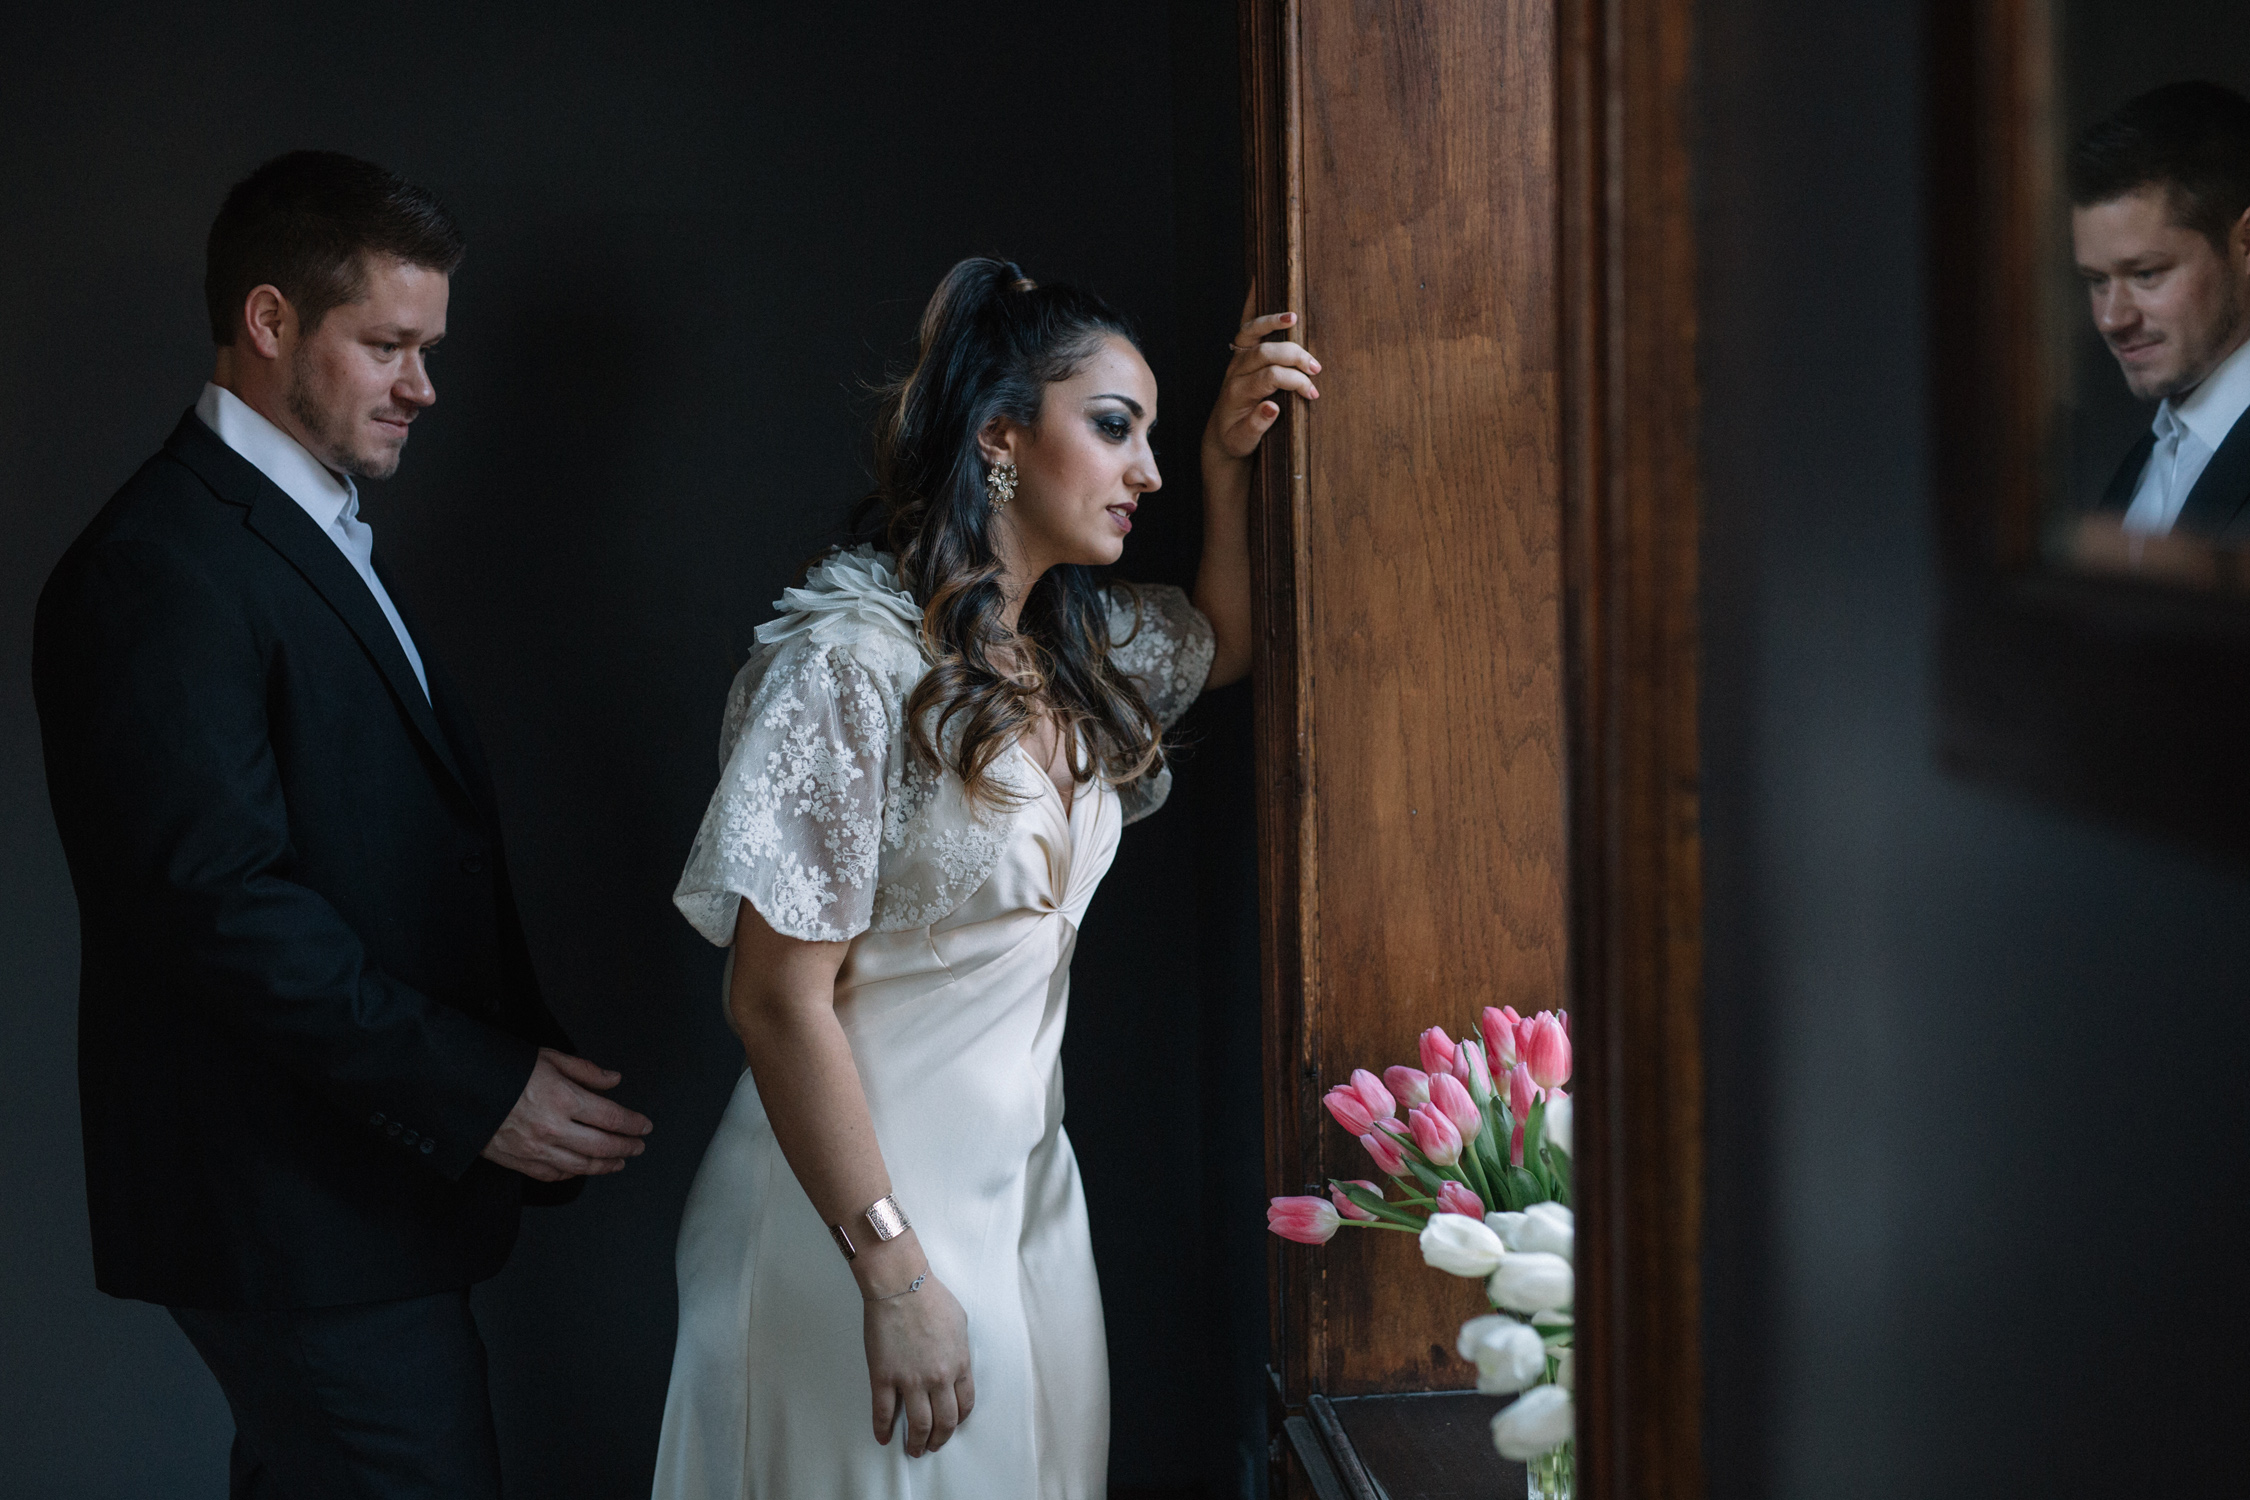 albany_wedding_boudoir_008.JPG